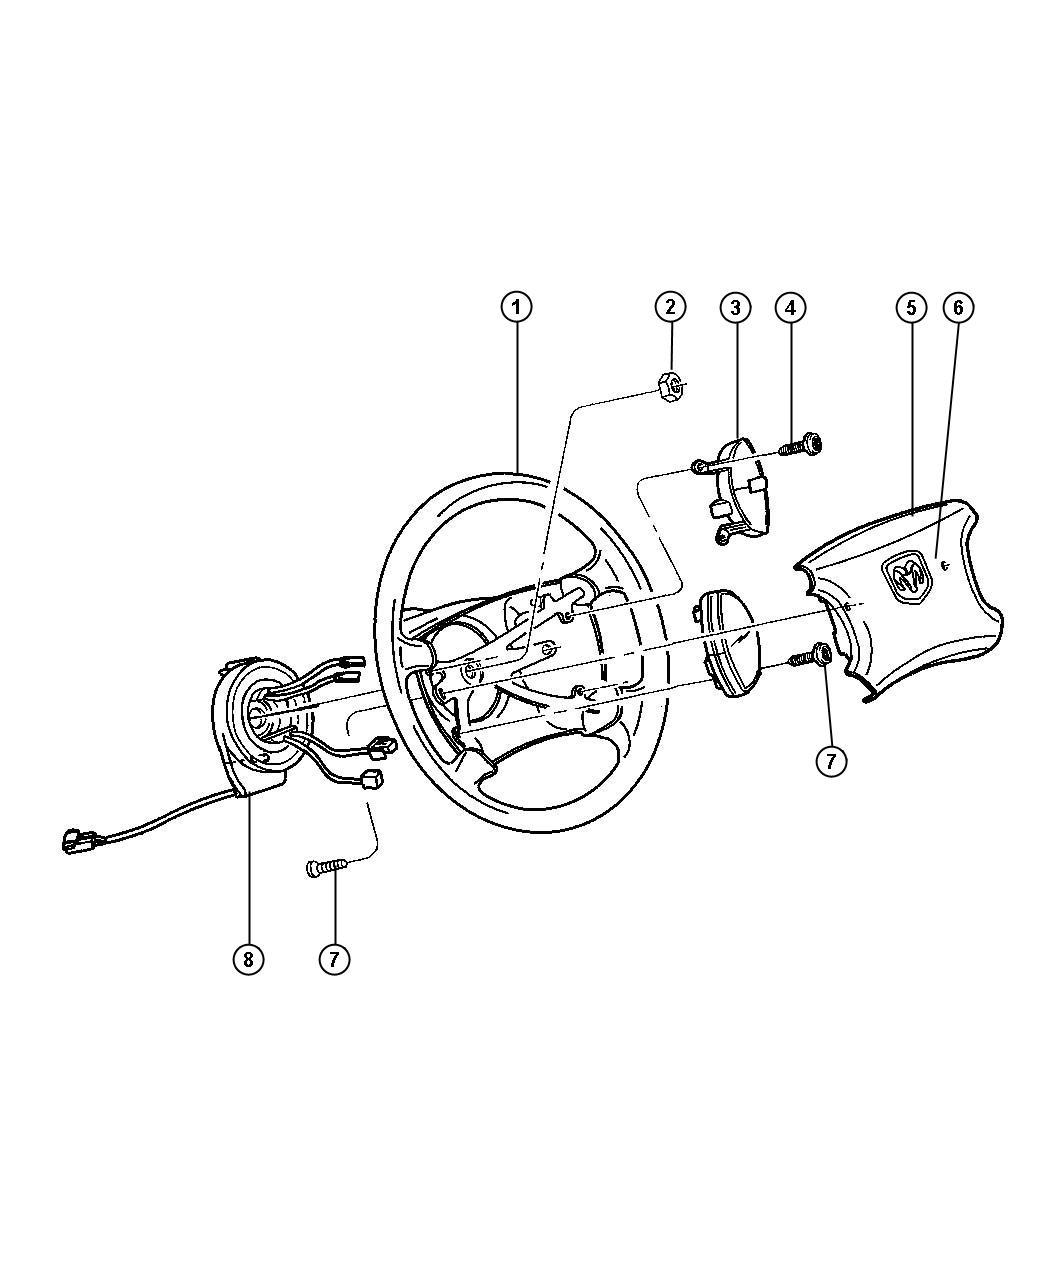 87 k5 blazer wiring diagram hei install | wiring diagram database chevy  blazer wiring diagram on